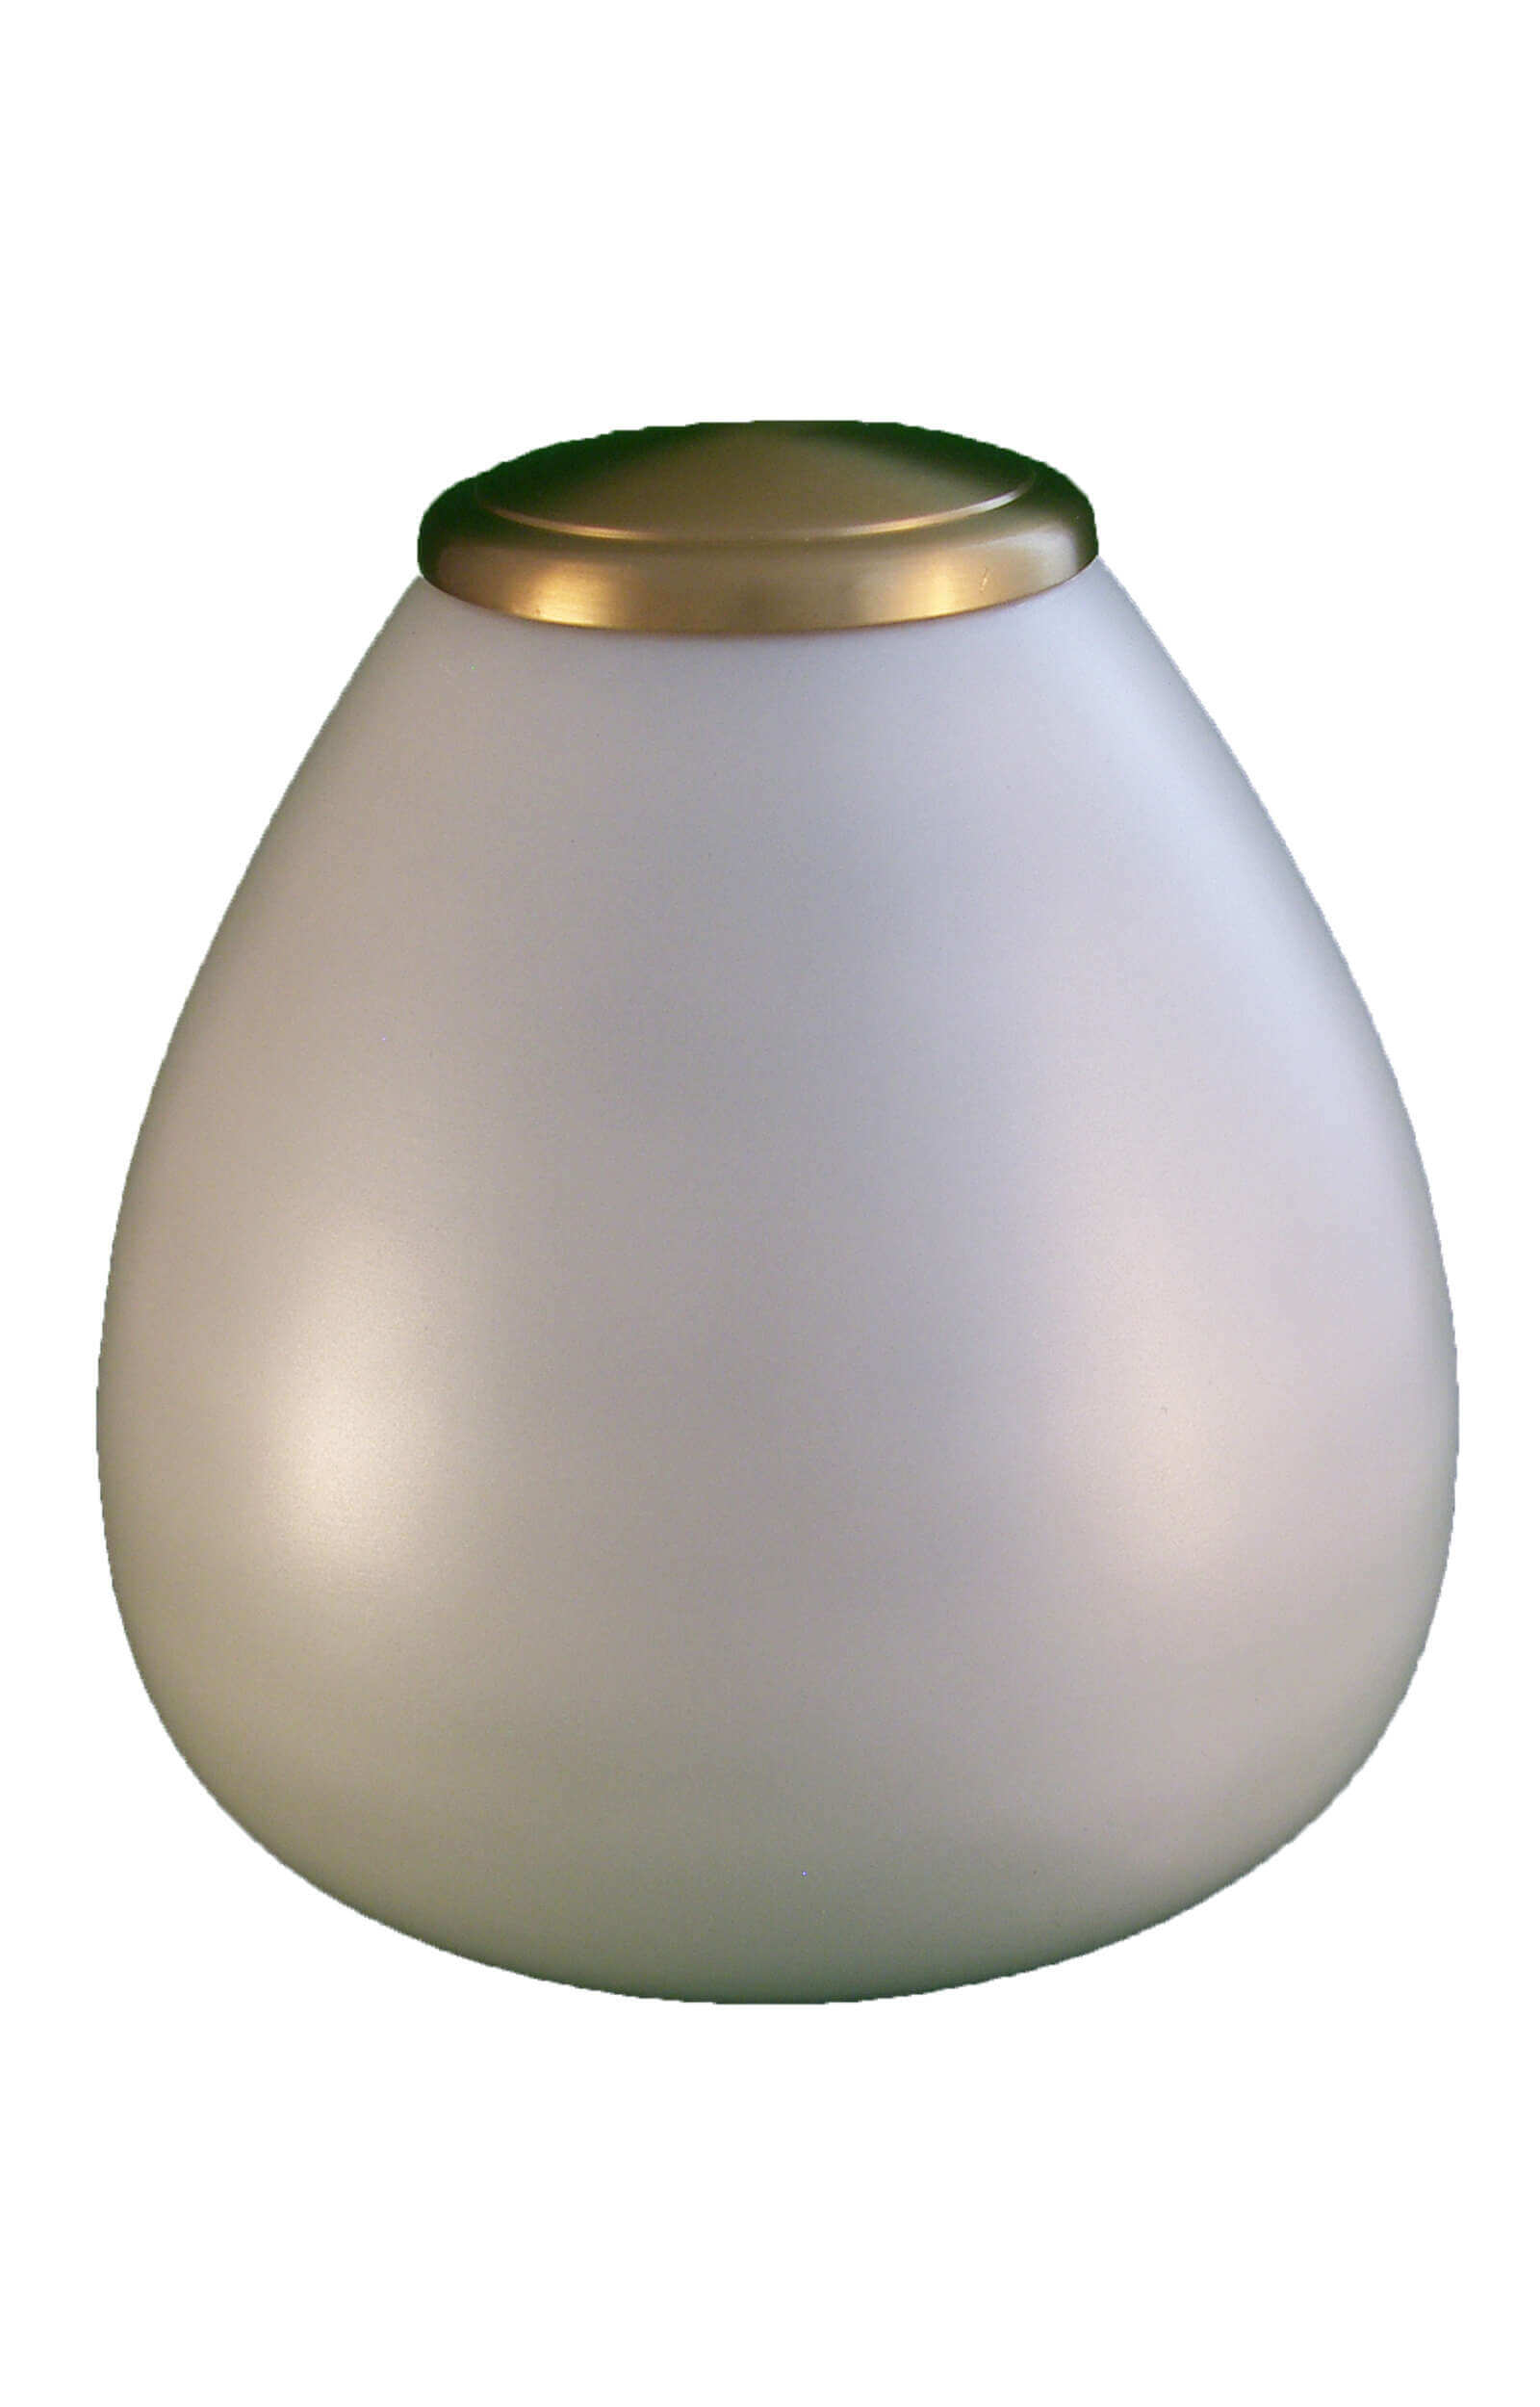 en TIB911 classic white and gold pet urn.jpg